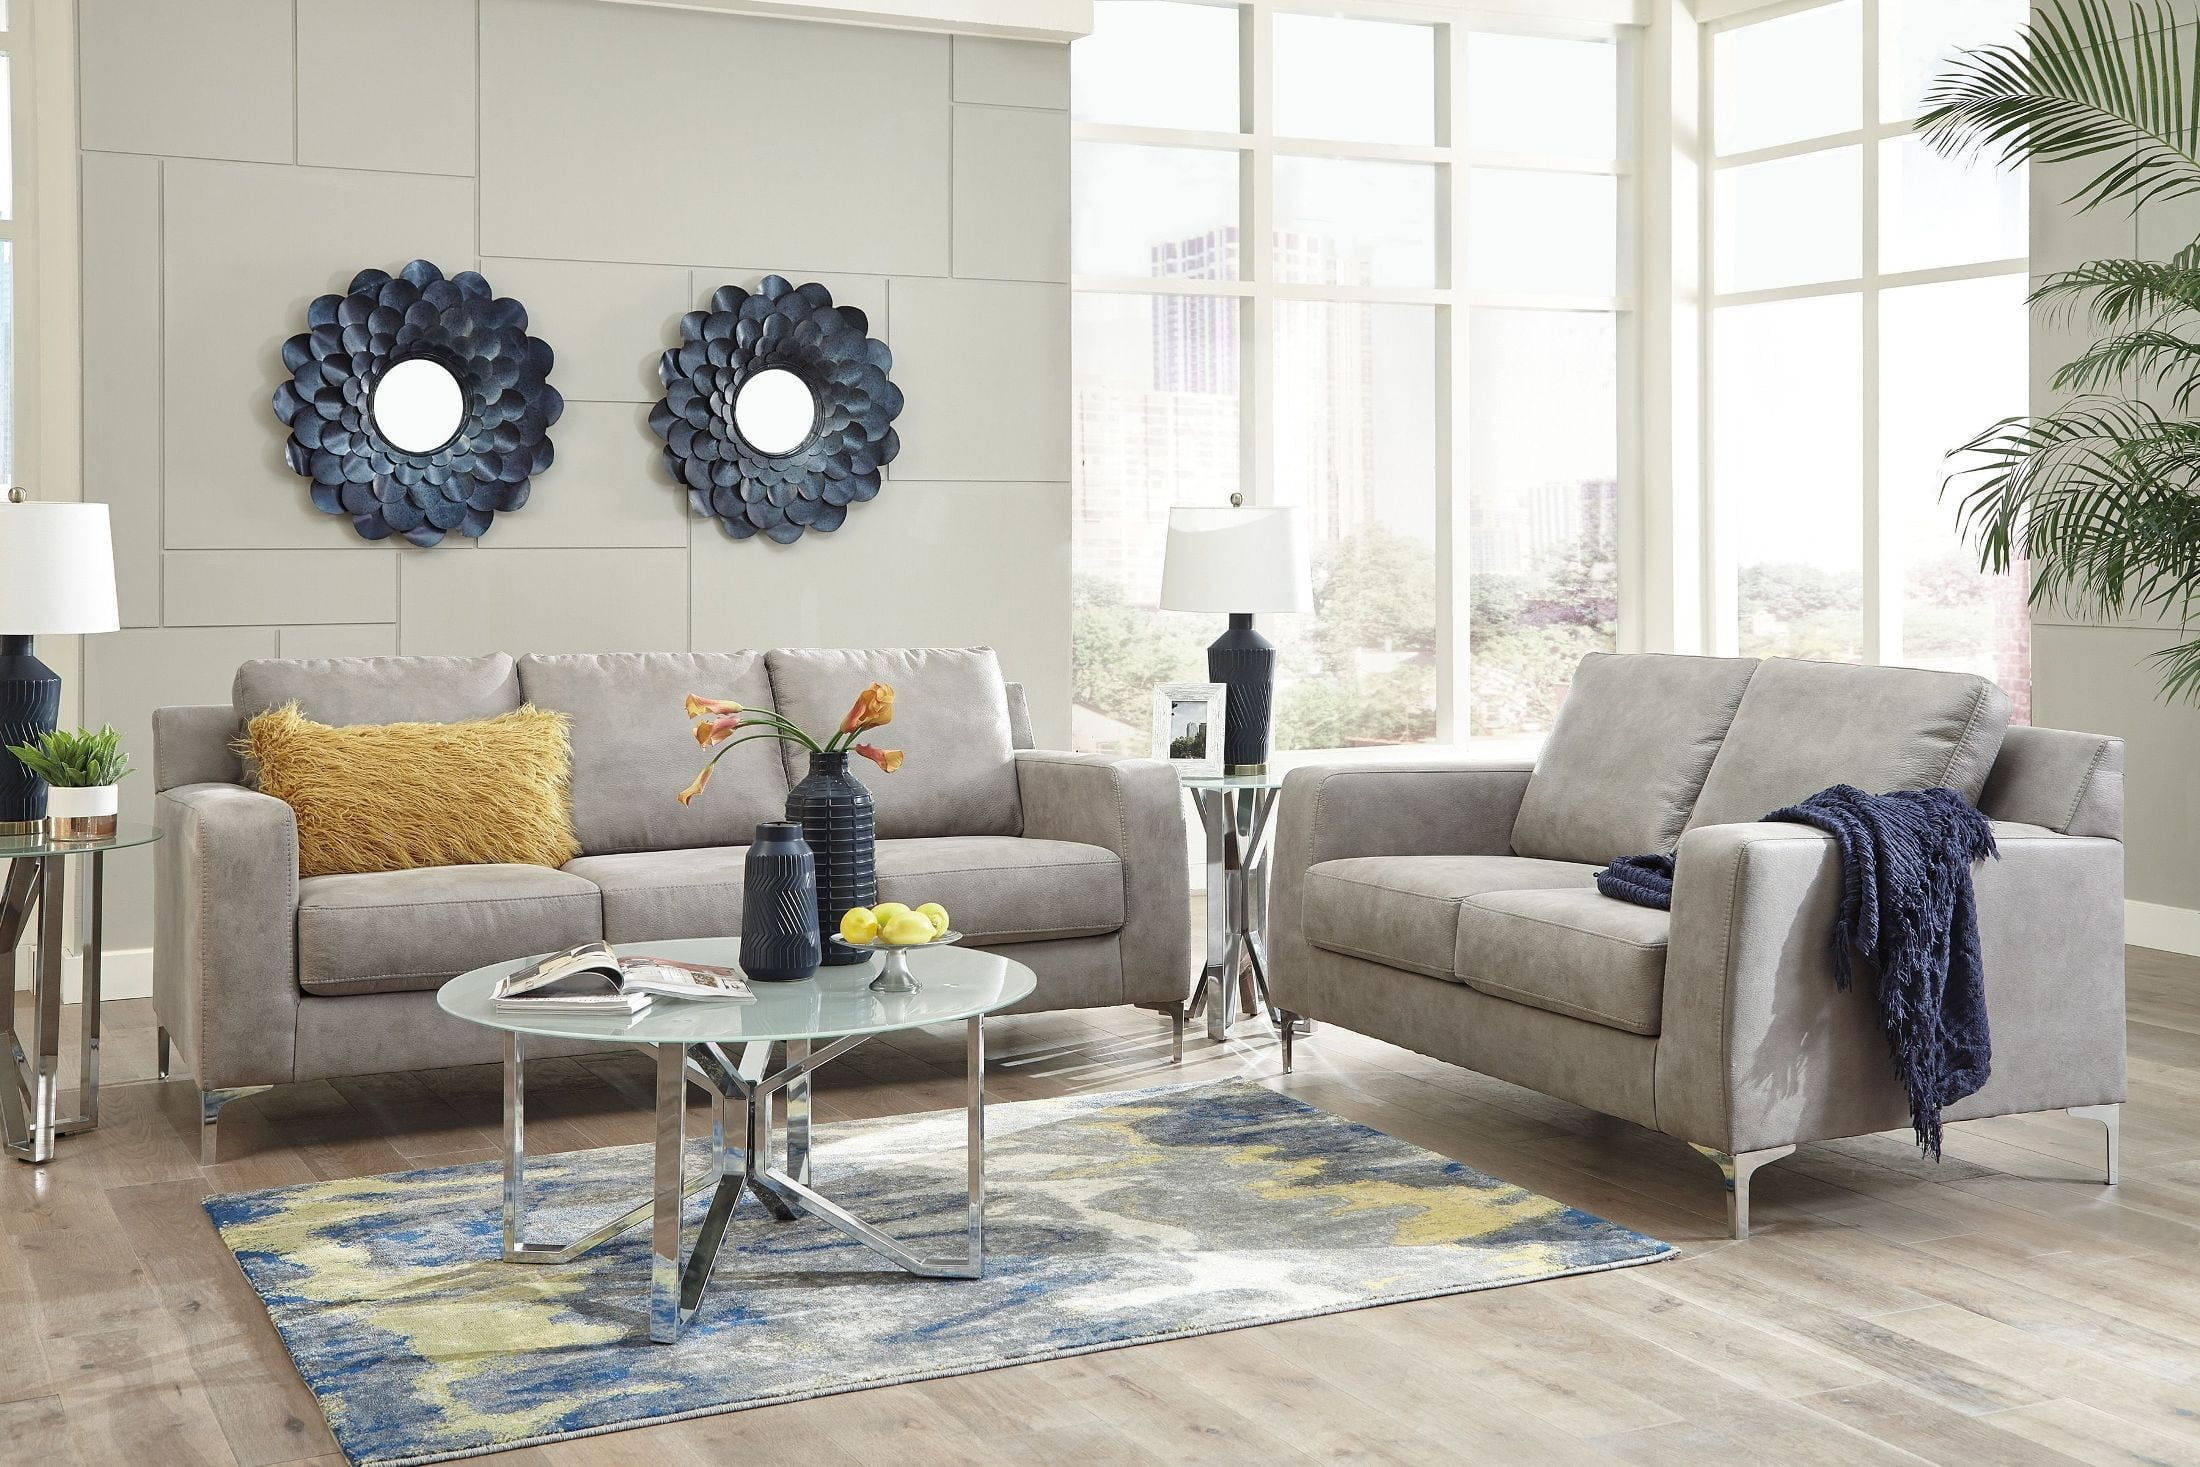 org l includes livings burnham scott set living igfusa beige dining room table